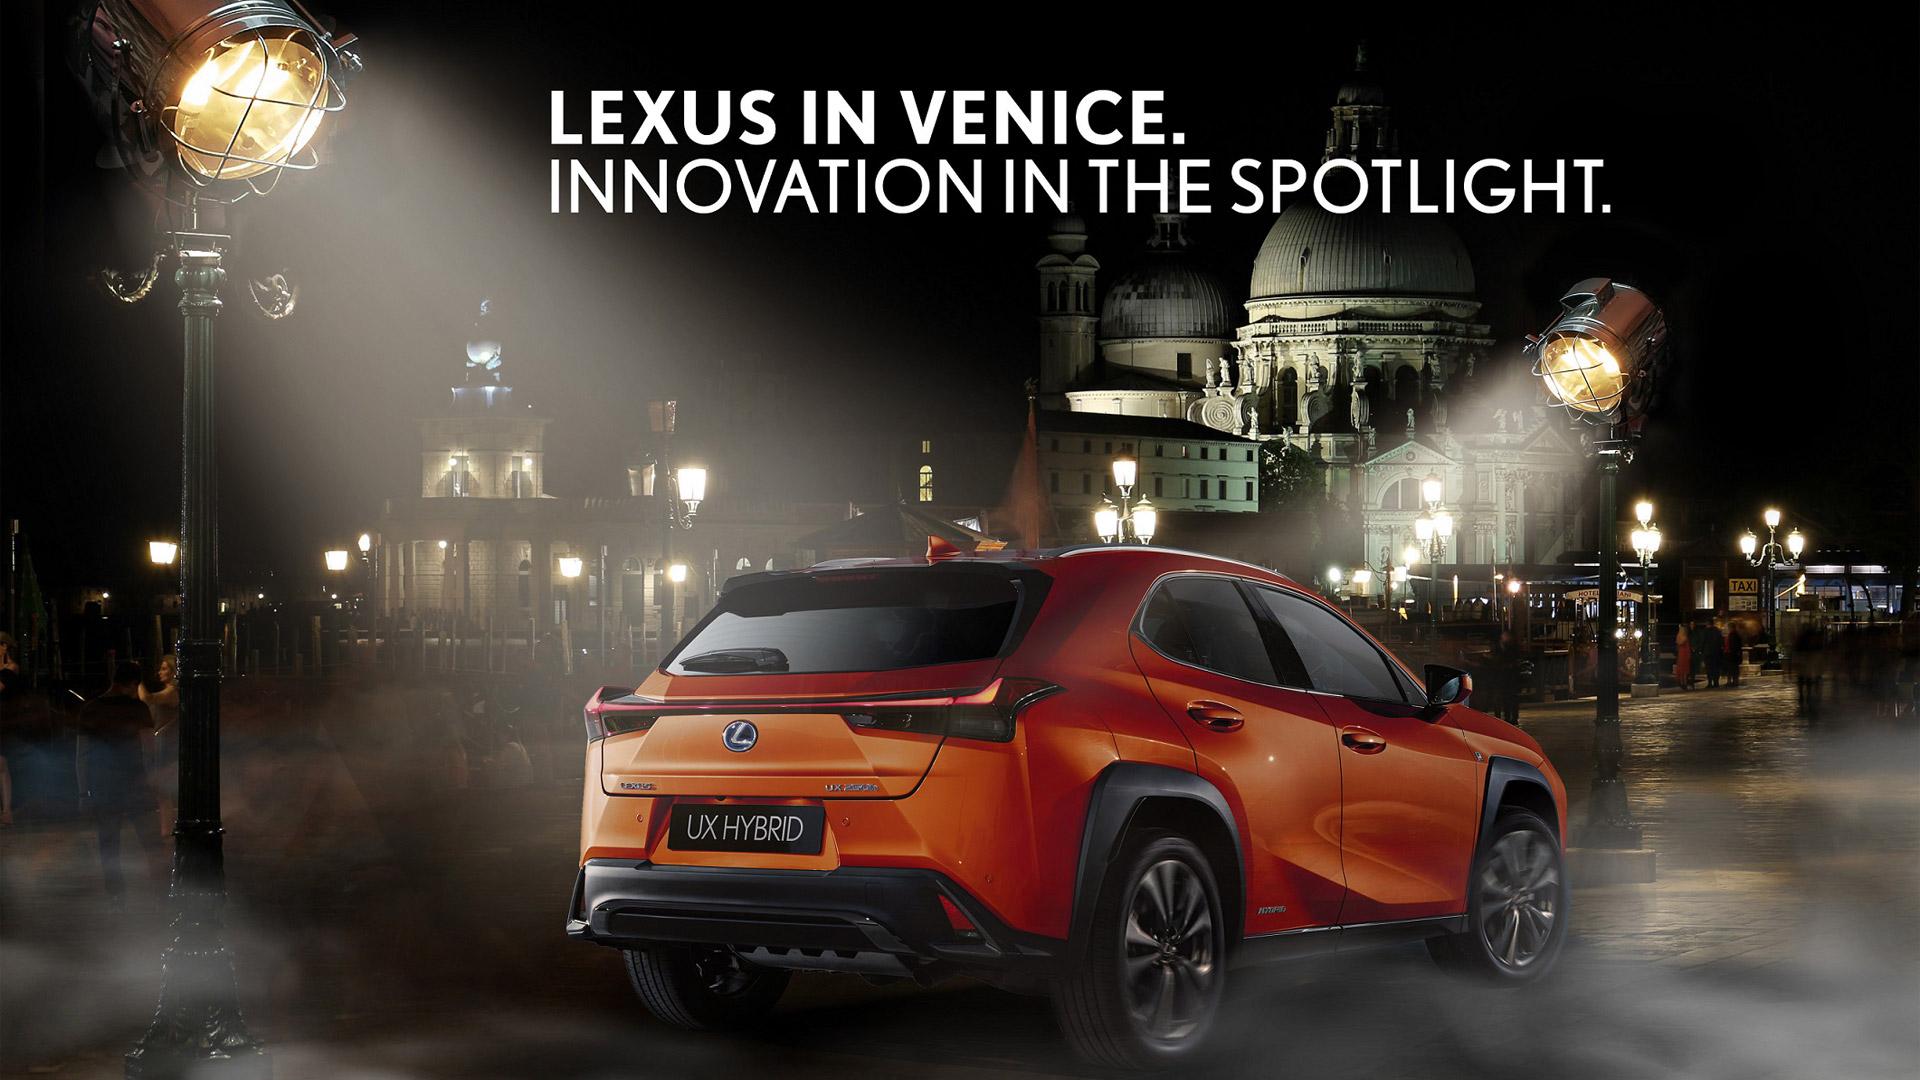 Lexus Venedik Film Festivali